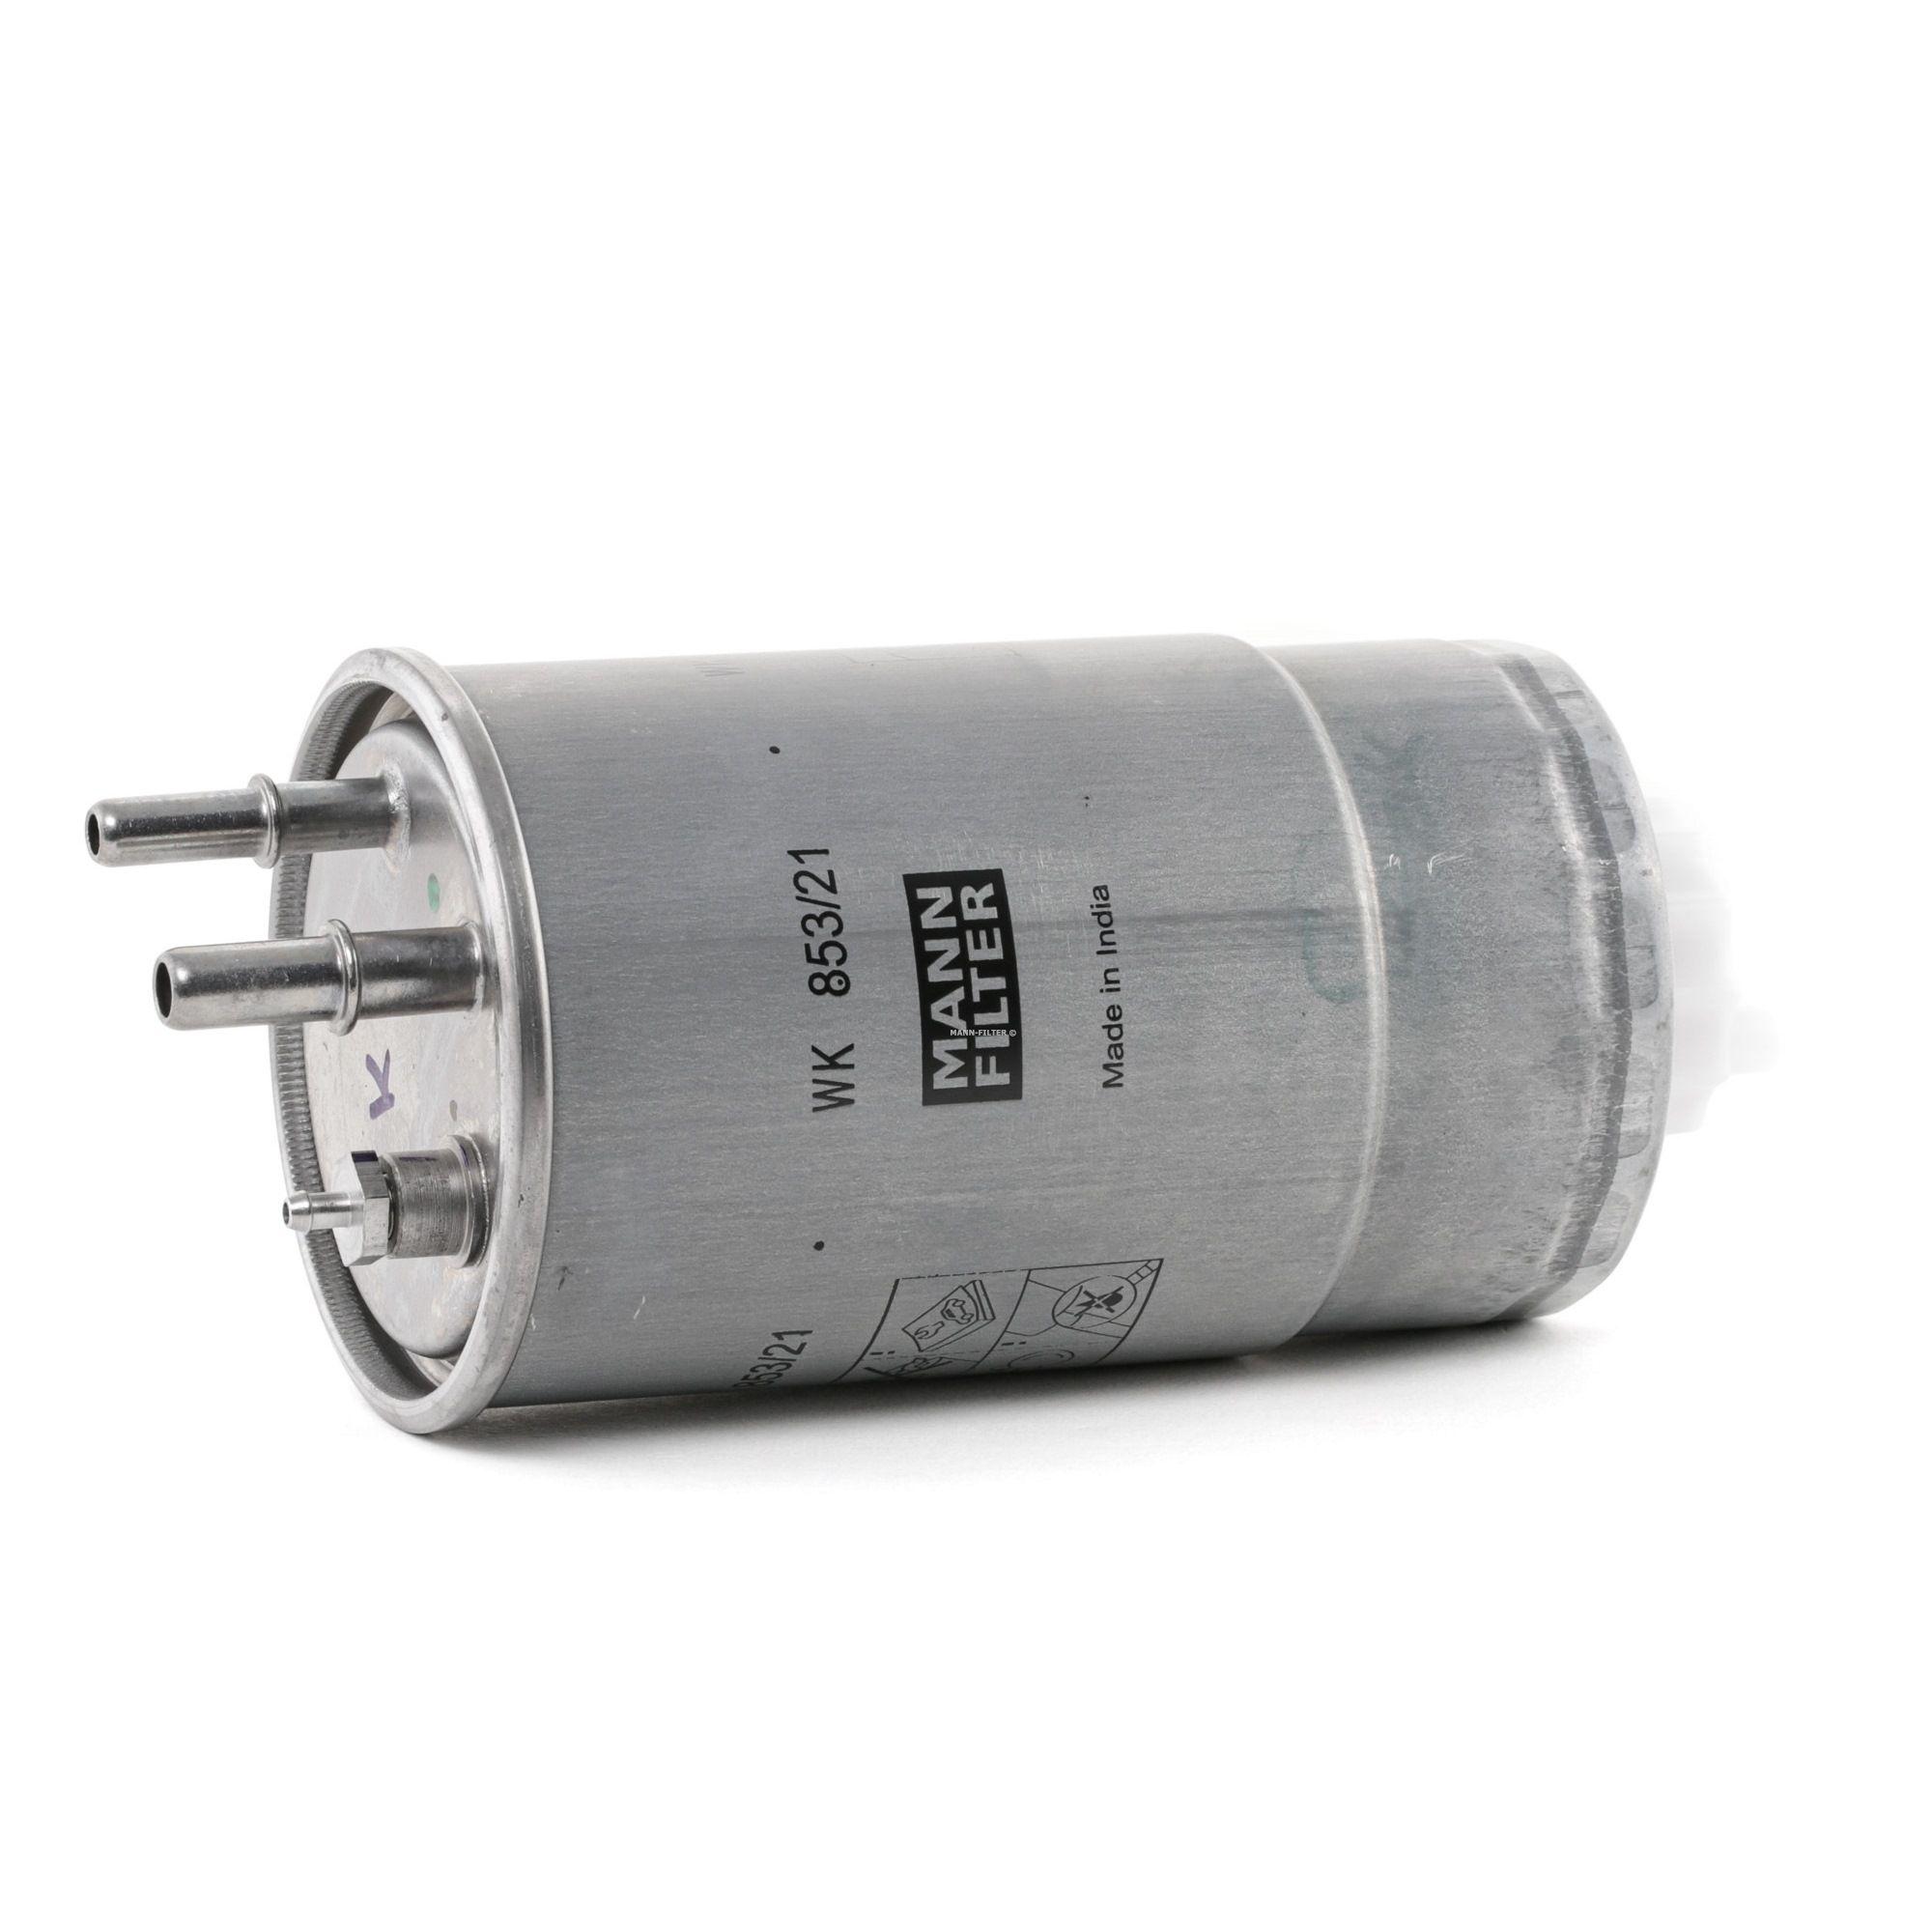 Original Palivový filtr WK 853/21 Ford